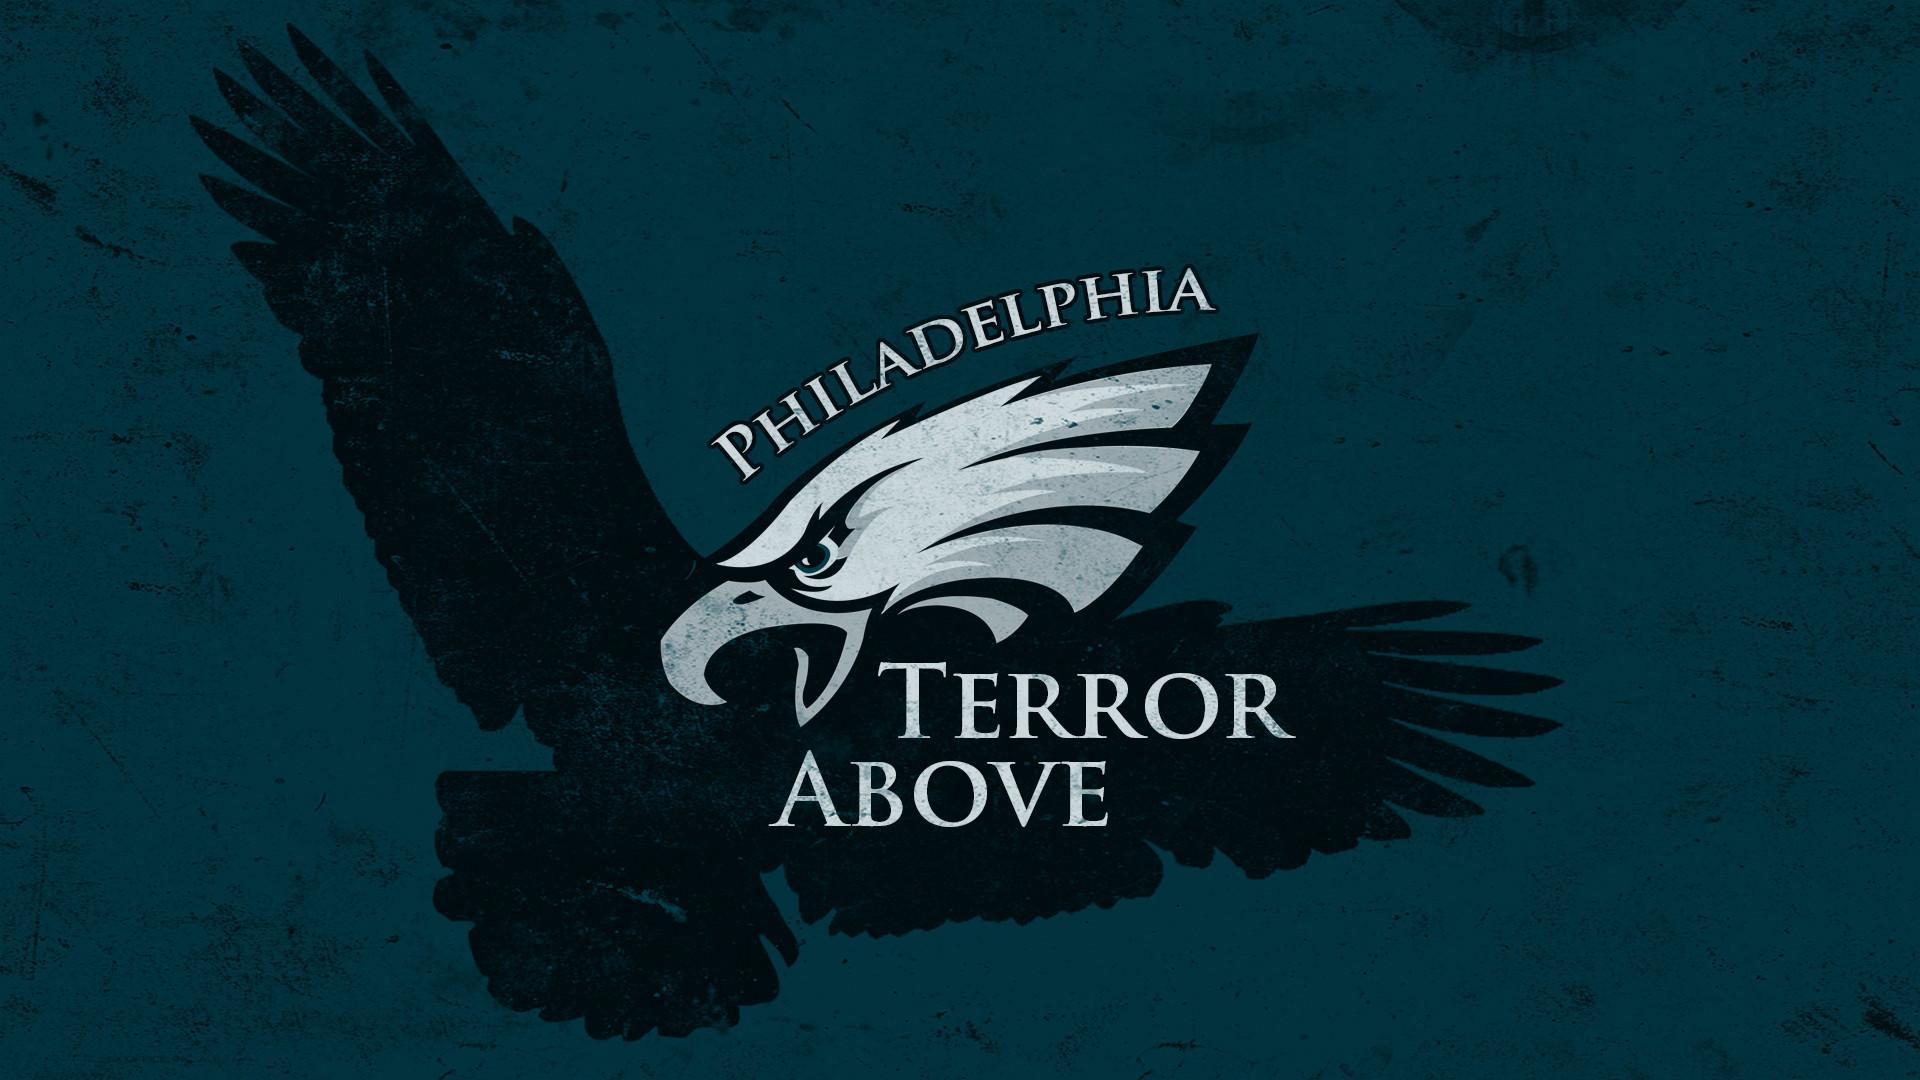 1920x1080 Philidelphia-Eagles-logo-wallpapers-HD-download